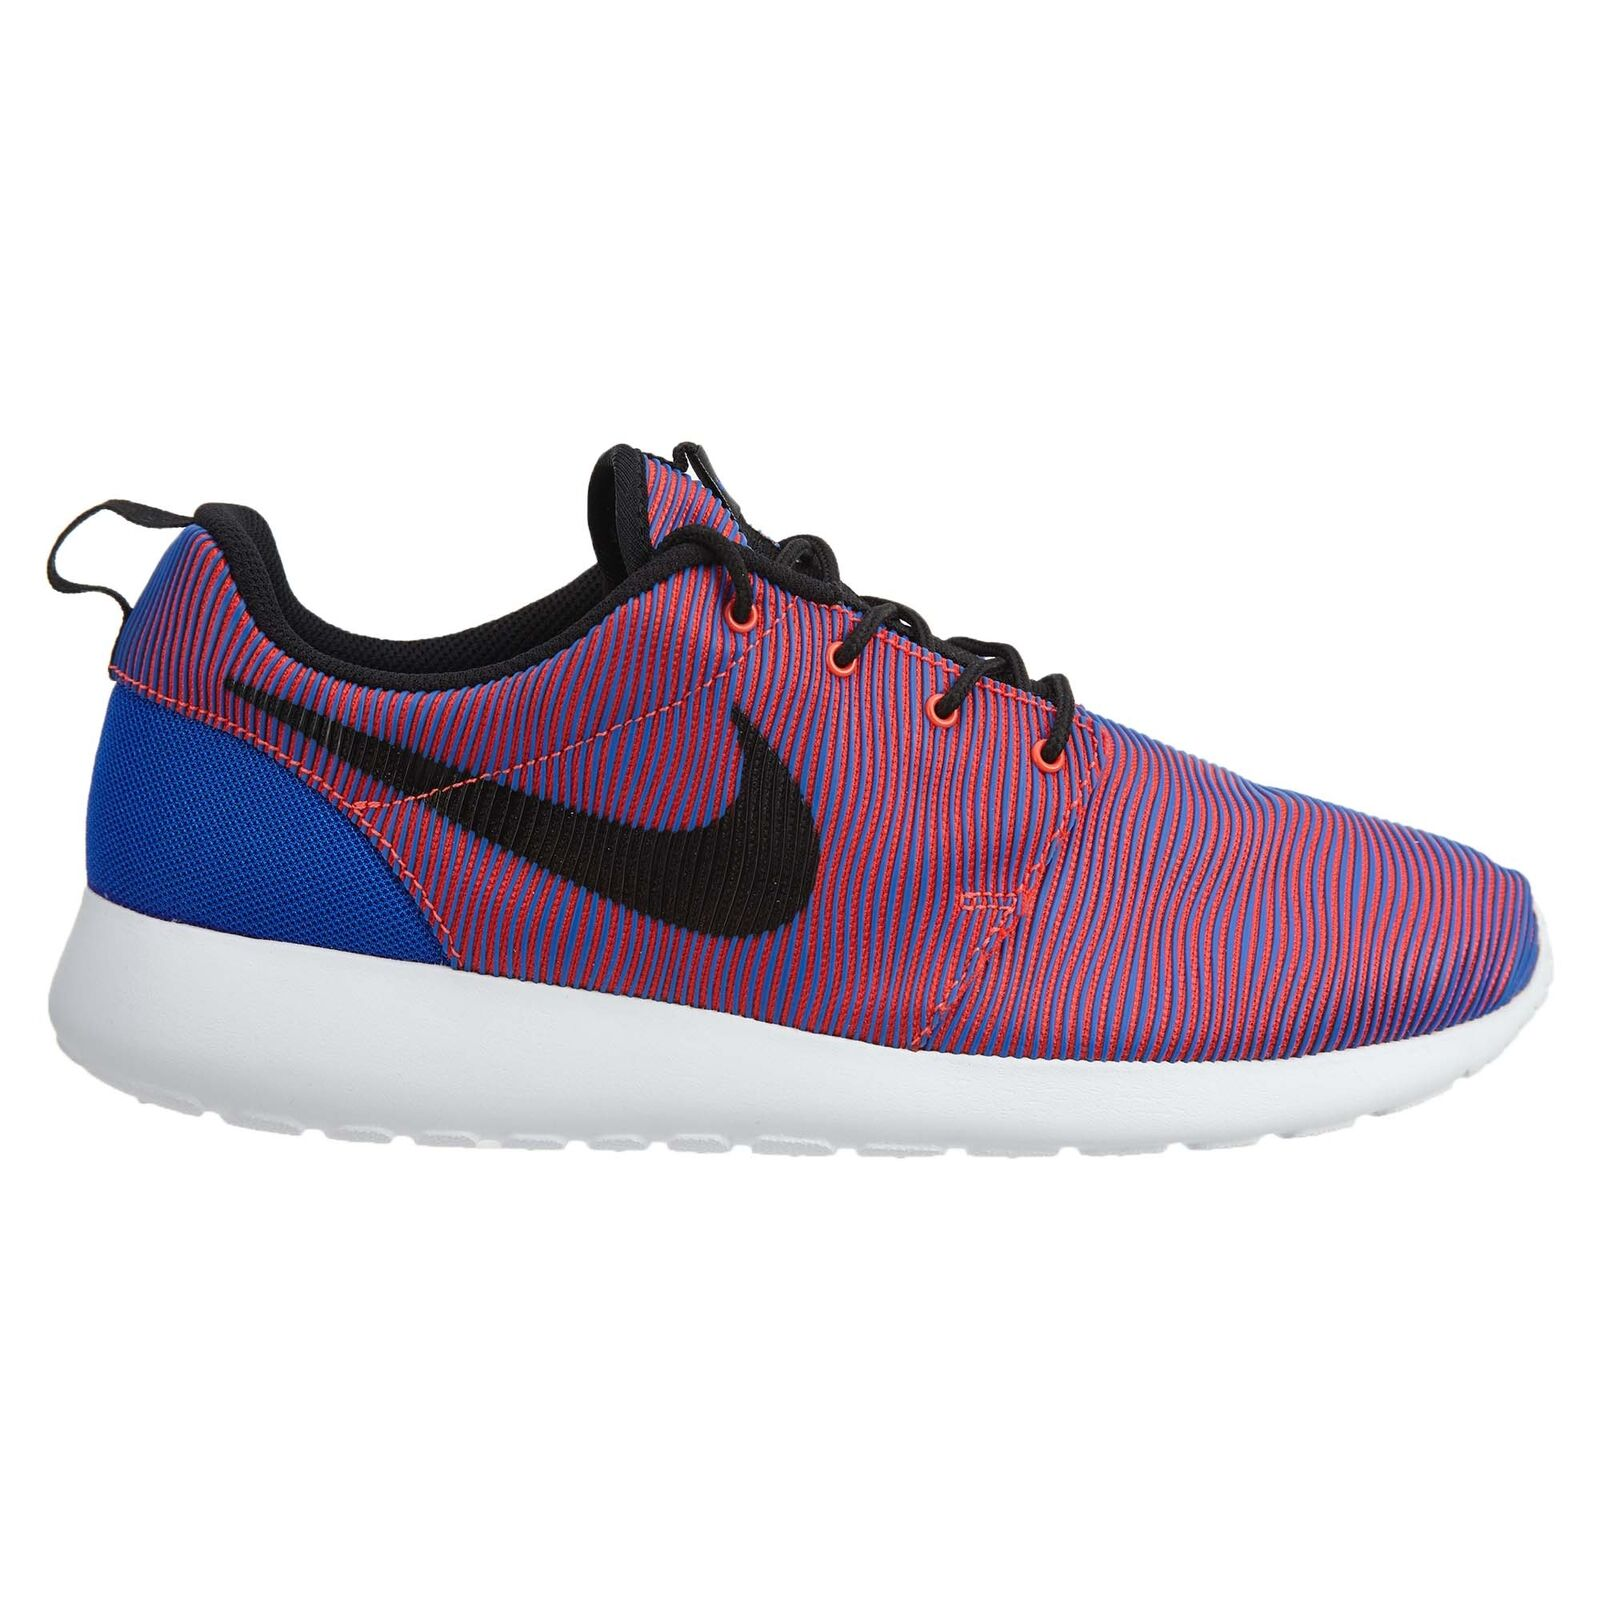 Nike Roshe One Premium Plus Mens 807611-407 Blue Crimson Running Shoes Size 10